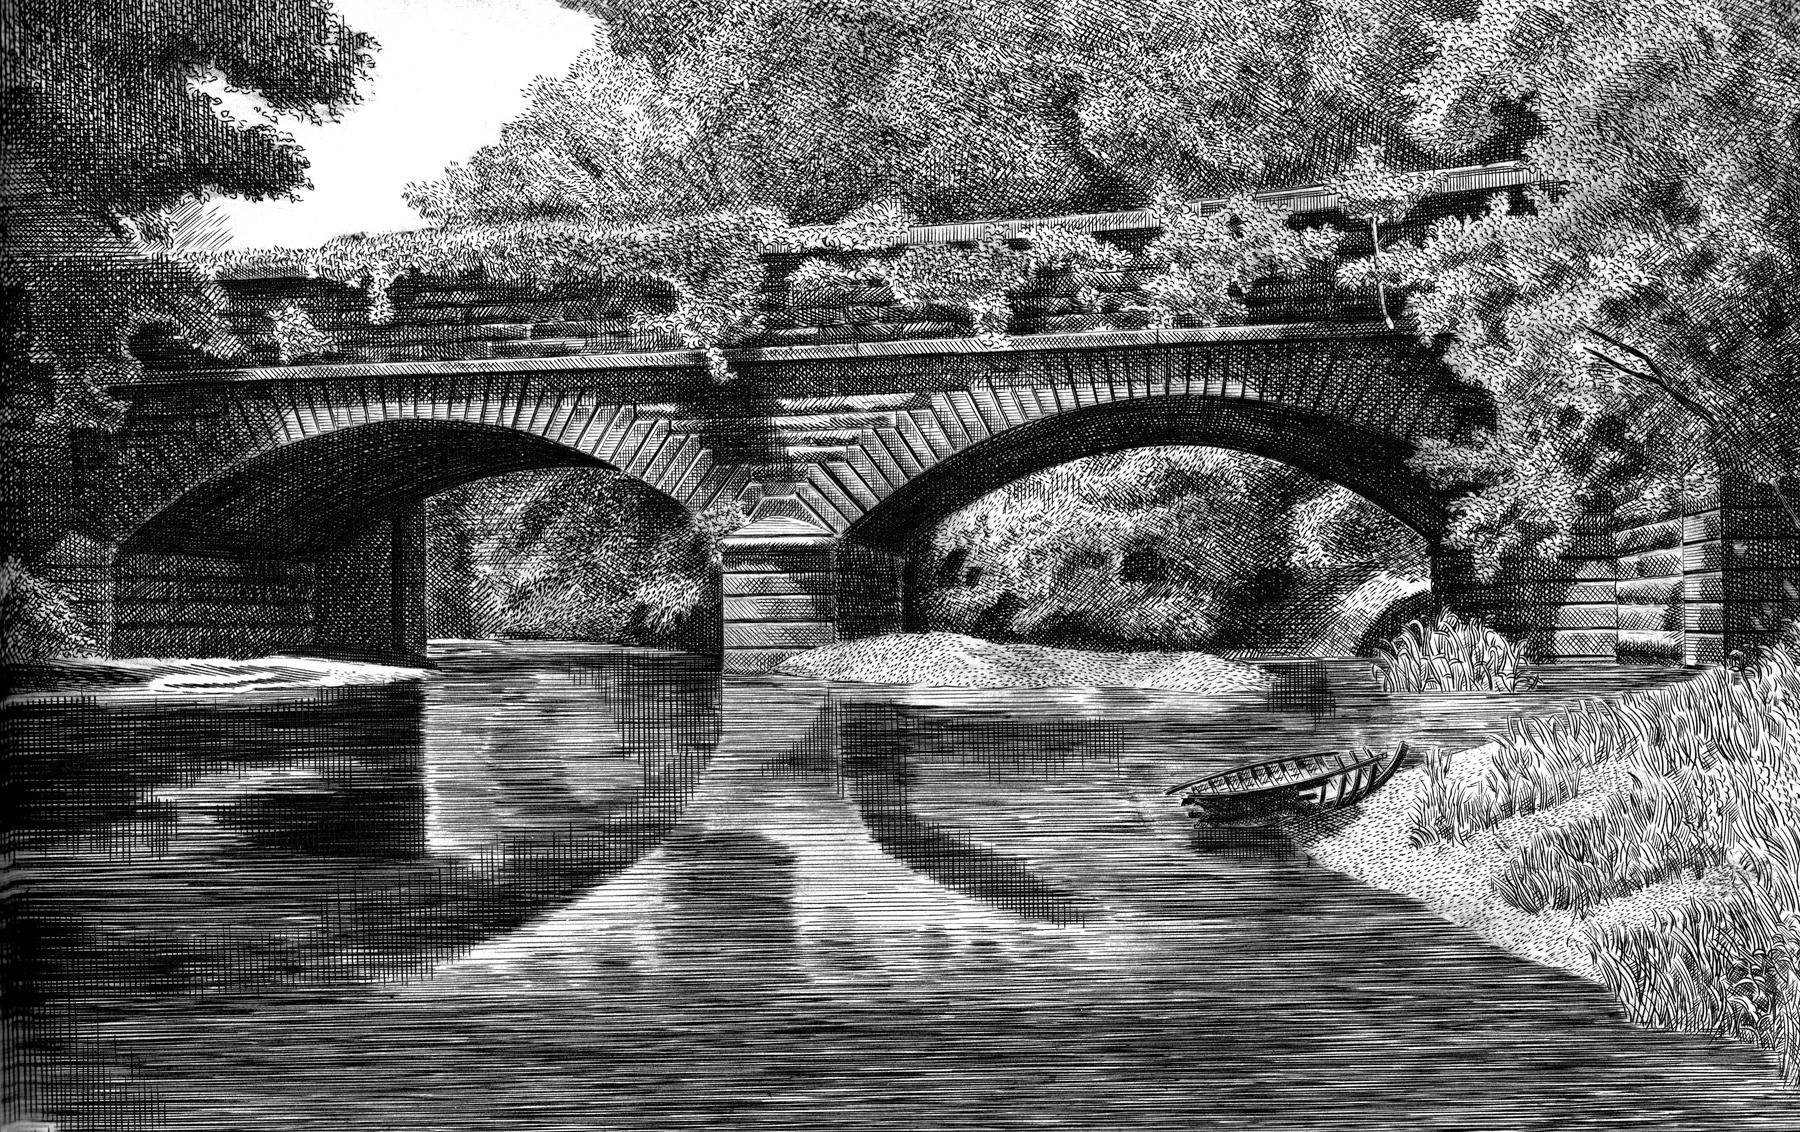 Gray_Hardware River Aqueduct  III_engraving_15x19.jpg